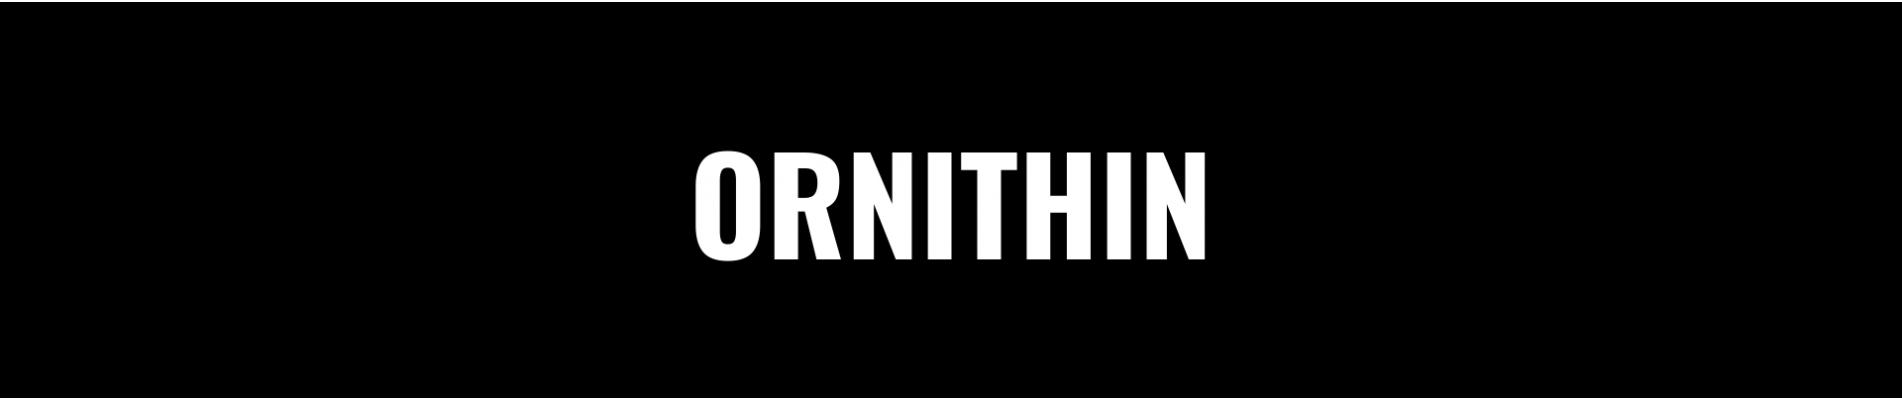 ORNITHIN